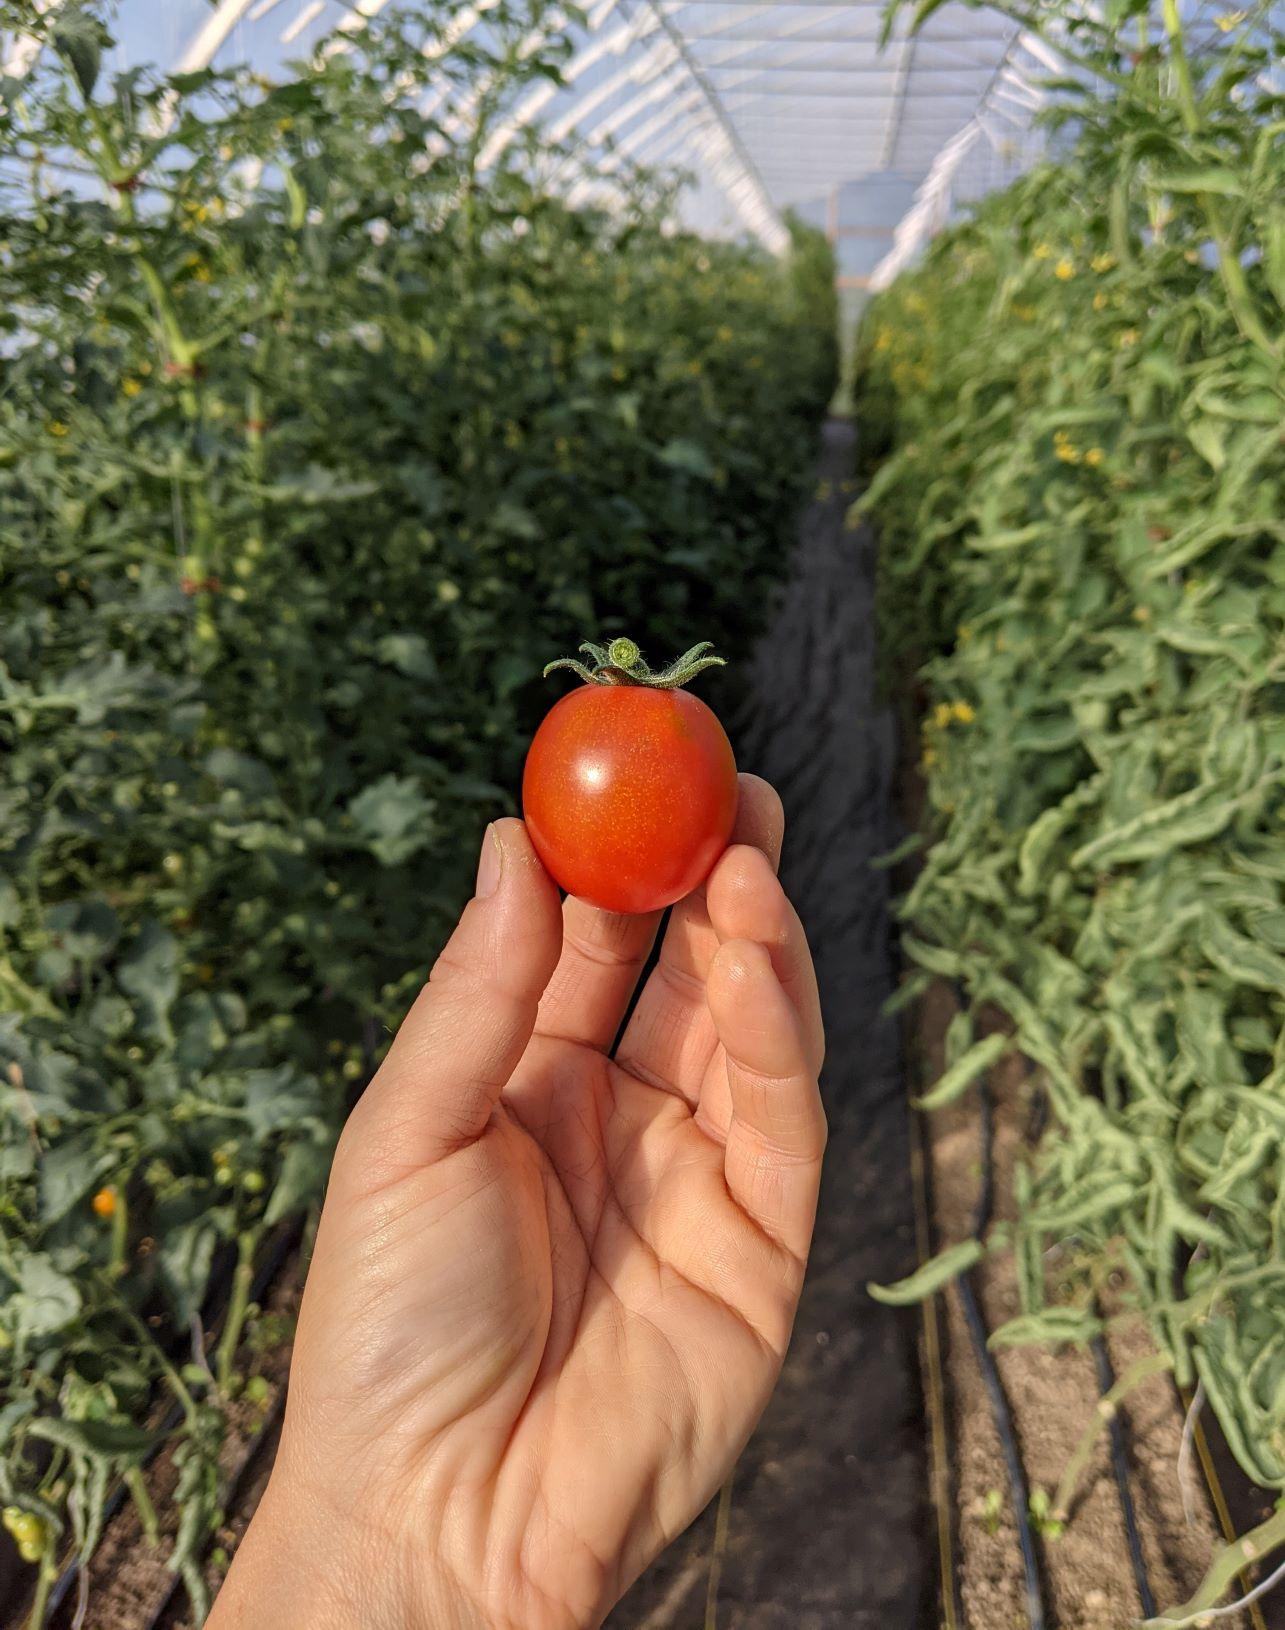 Farm Share - week of July 12